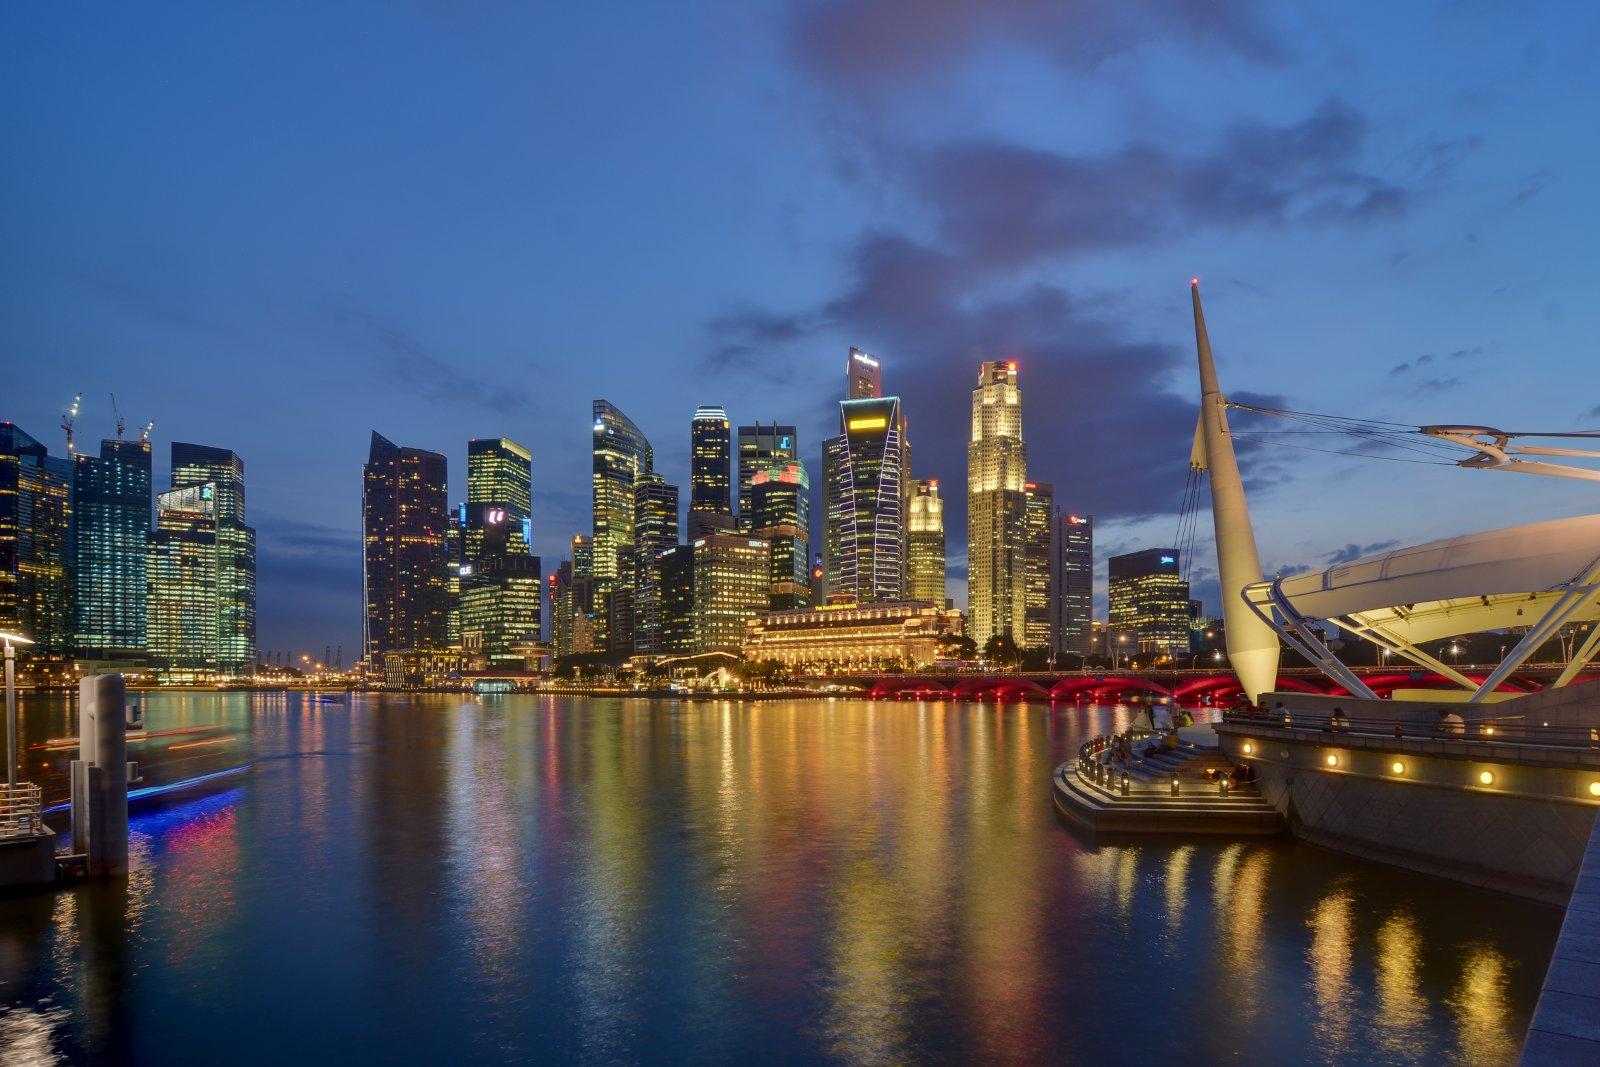 Singapore_CBD_skyline_from_Esplanade_at_dusk